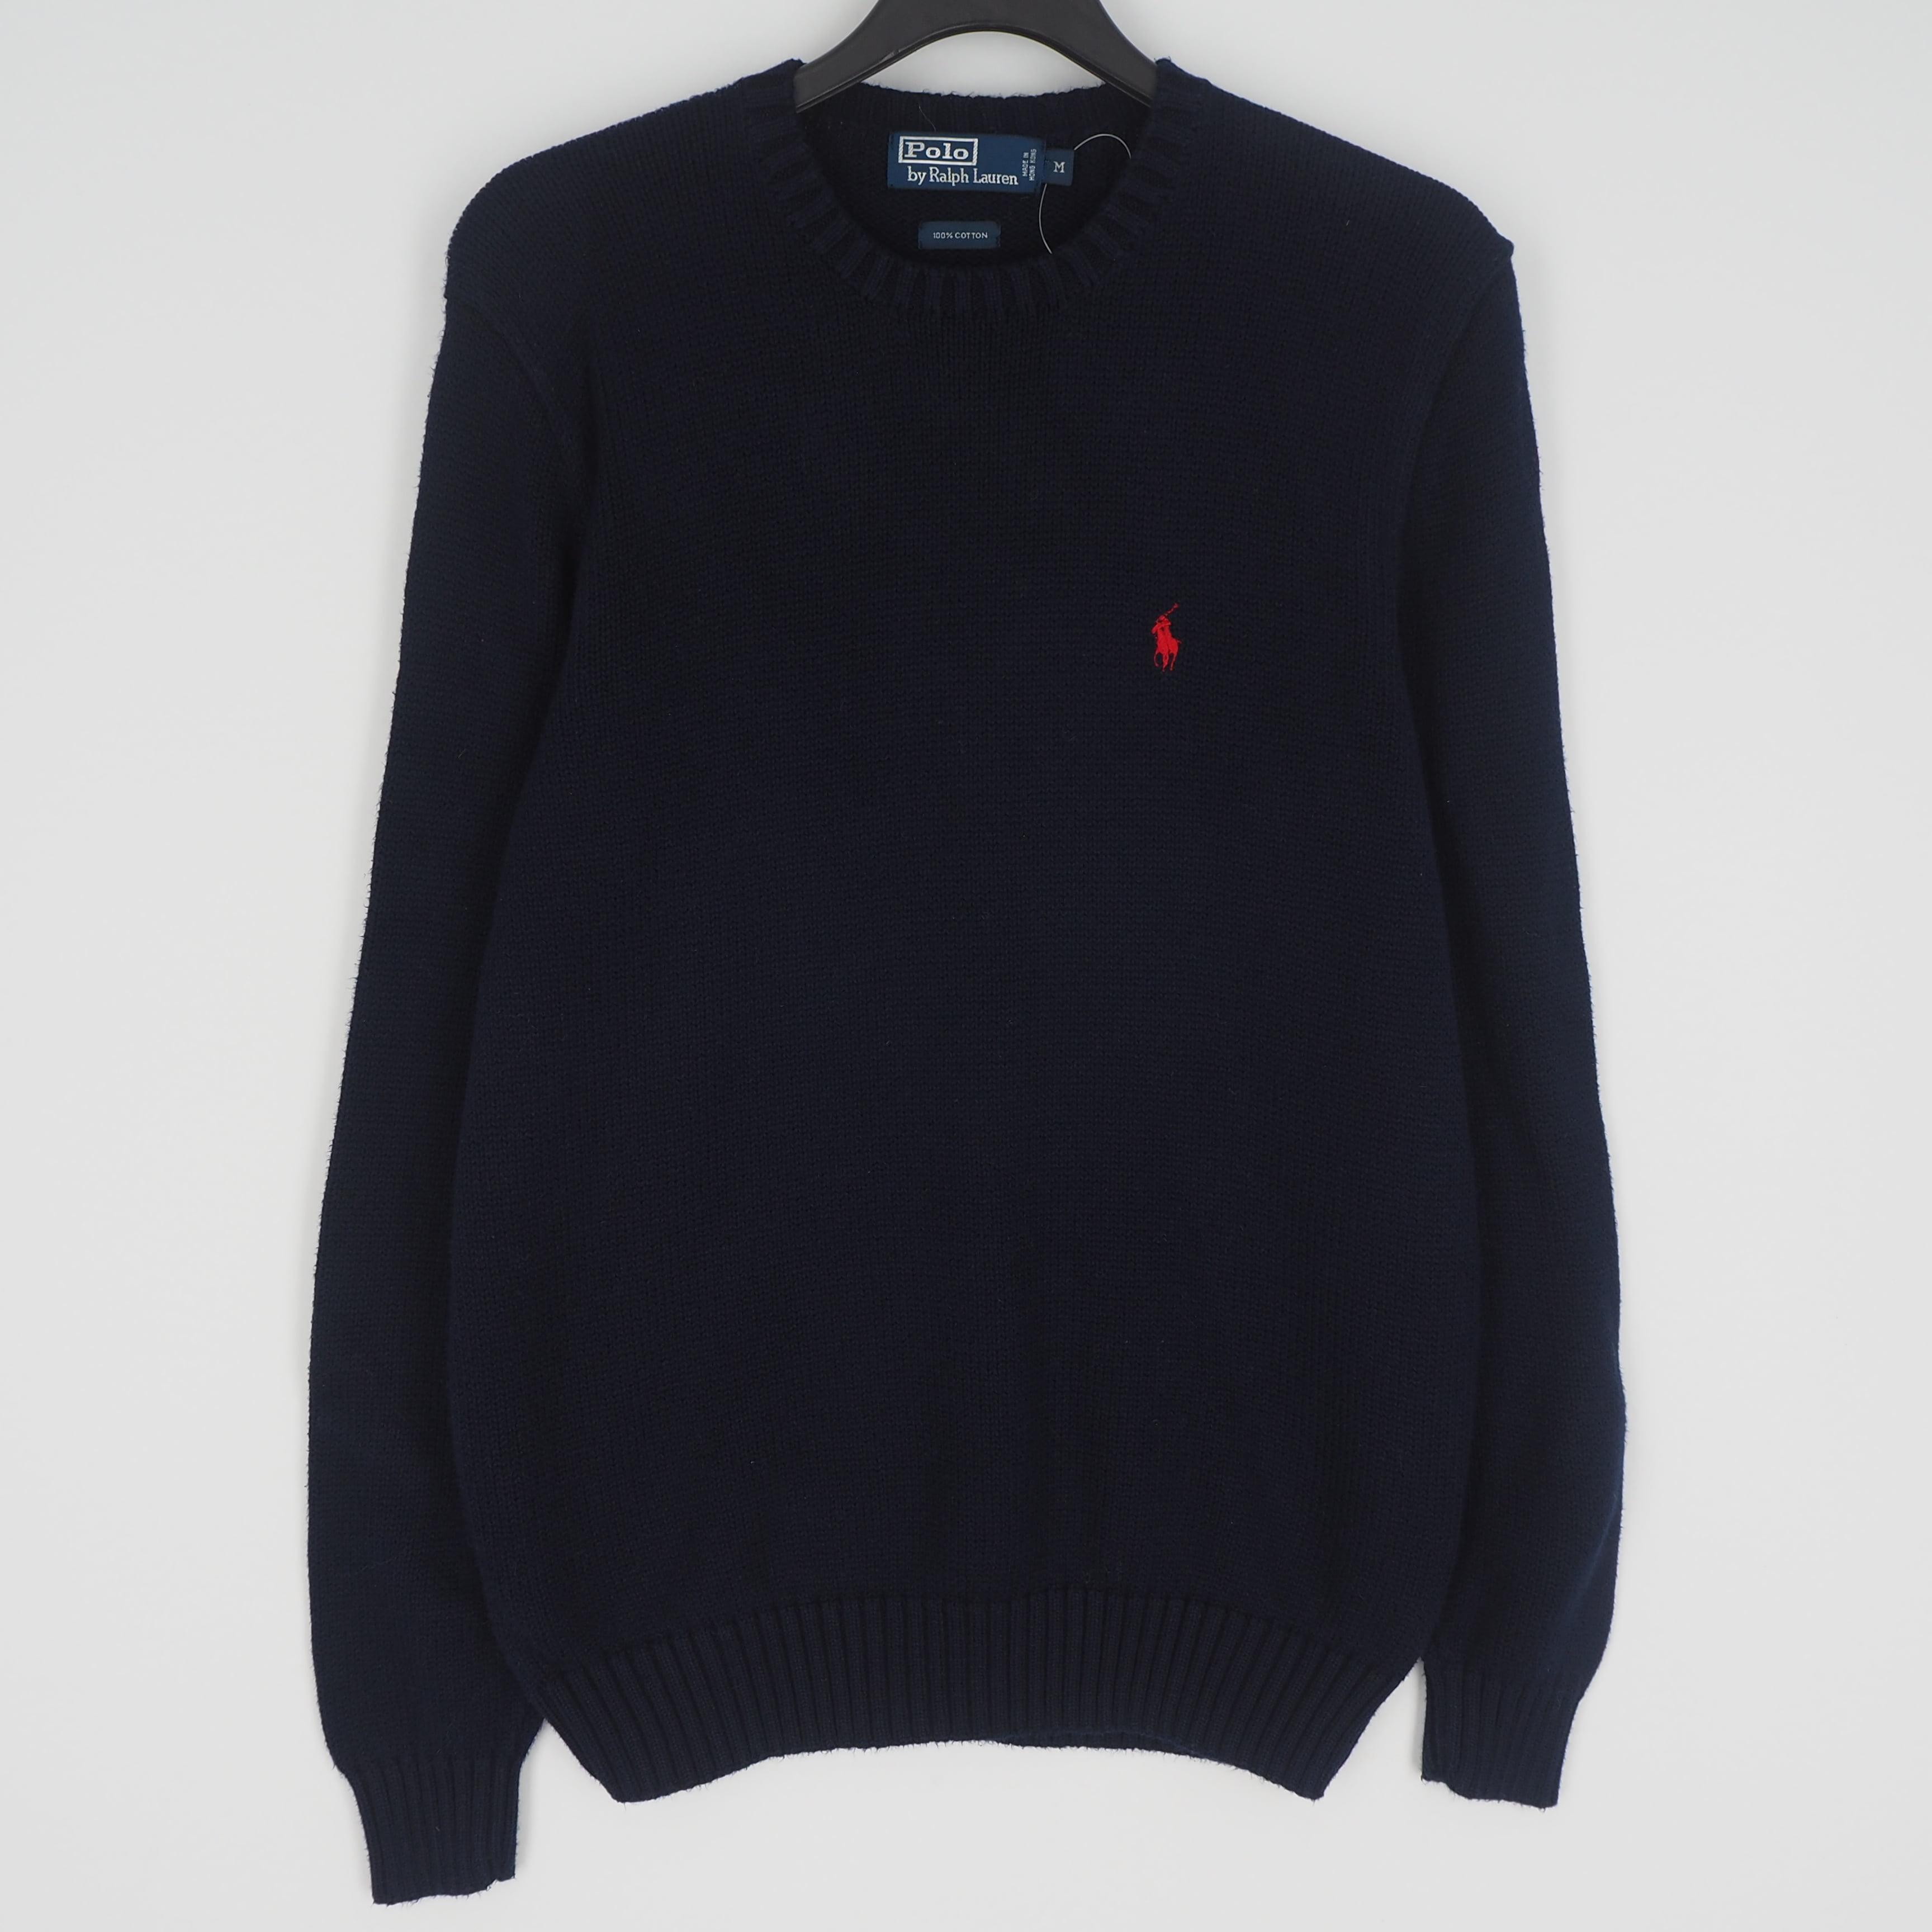 [L] 랄프로렌 긴팔 니트/스웨터